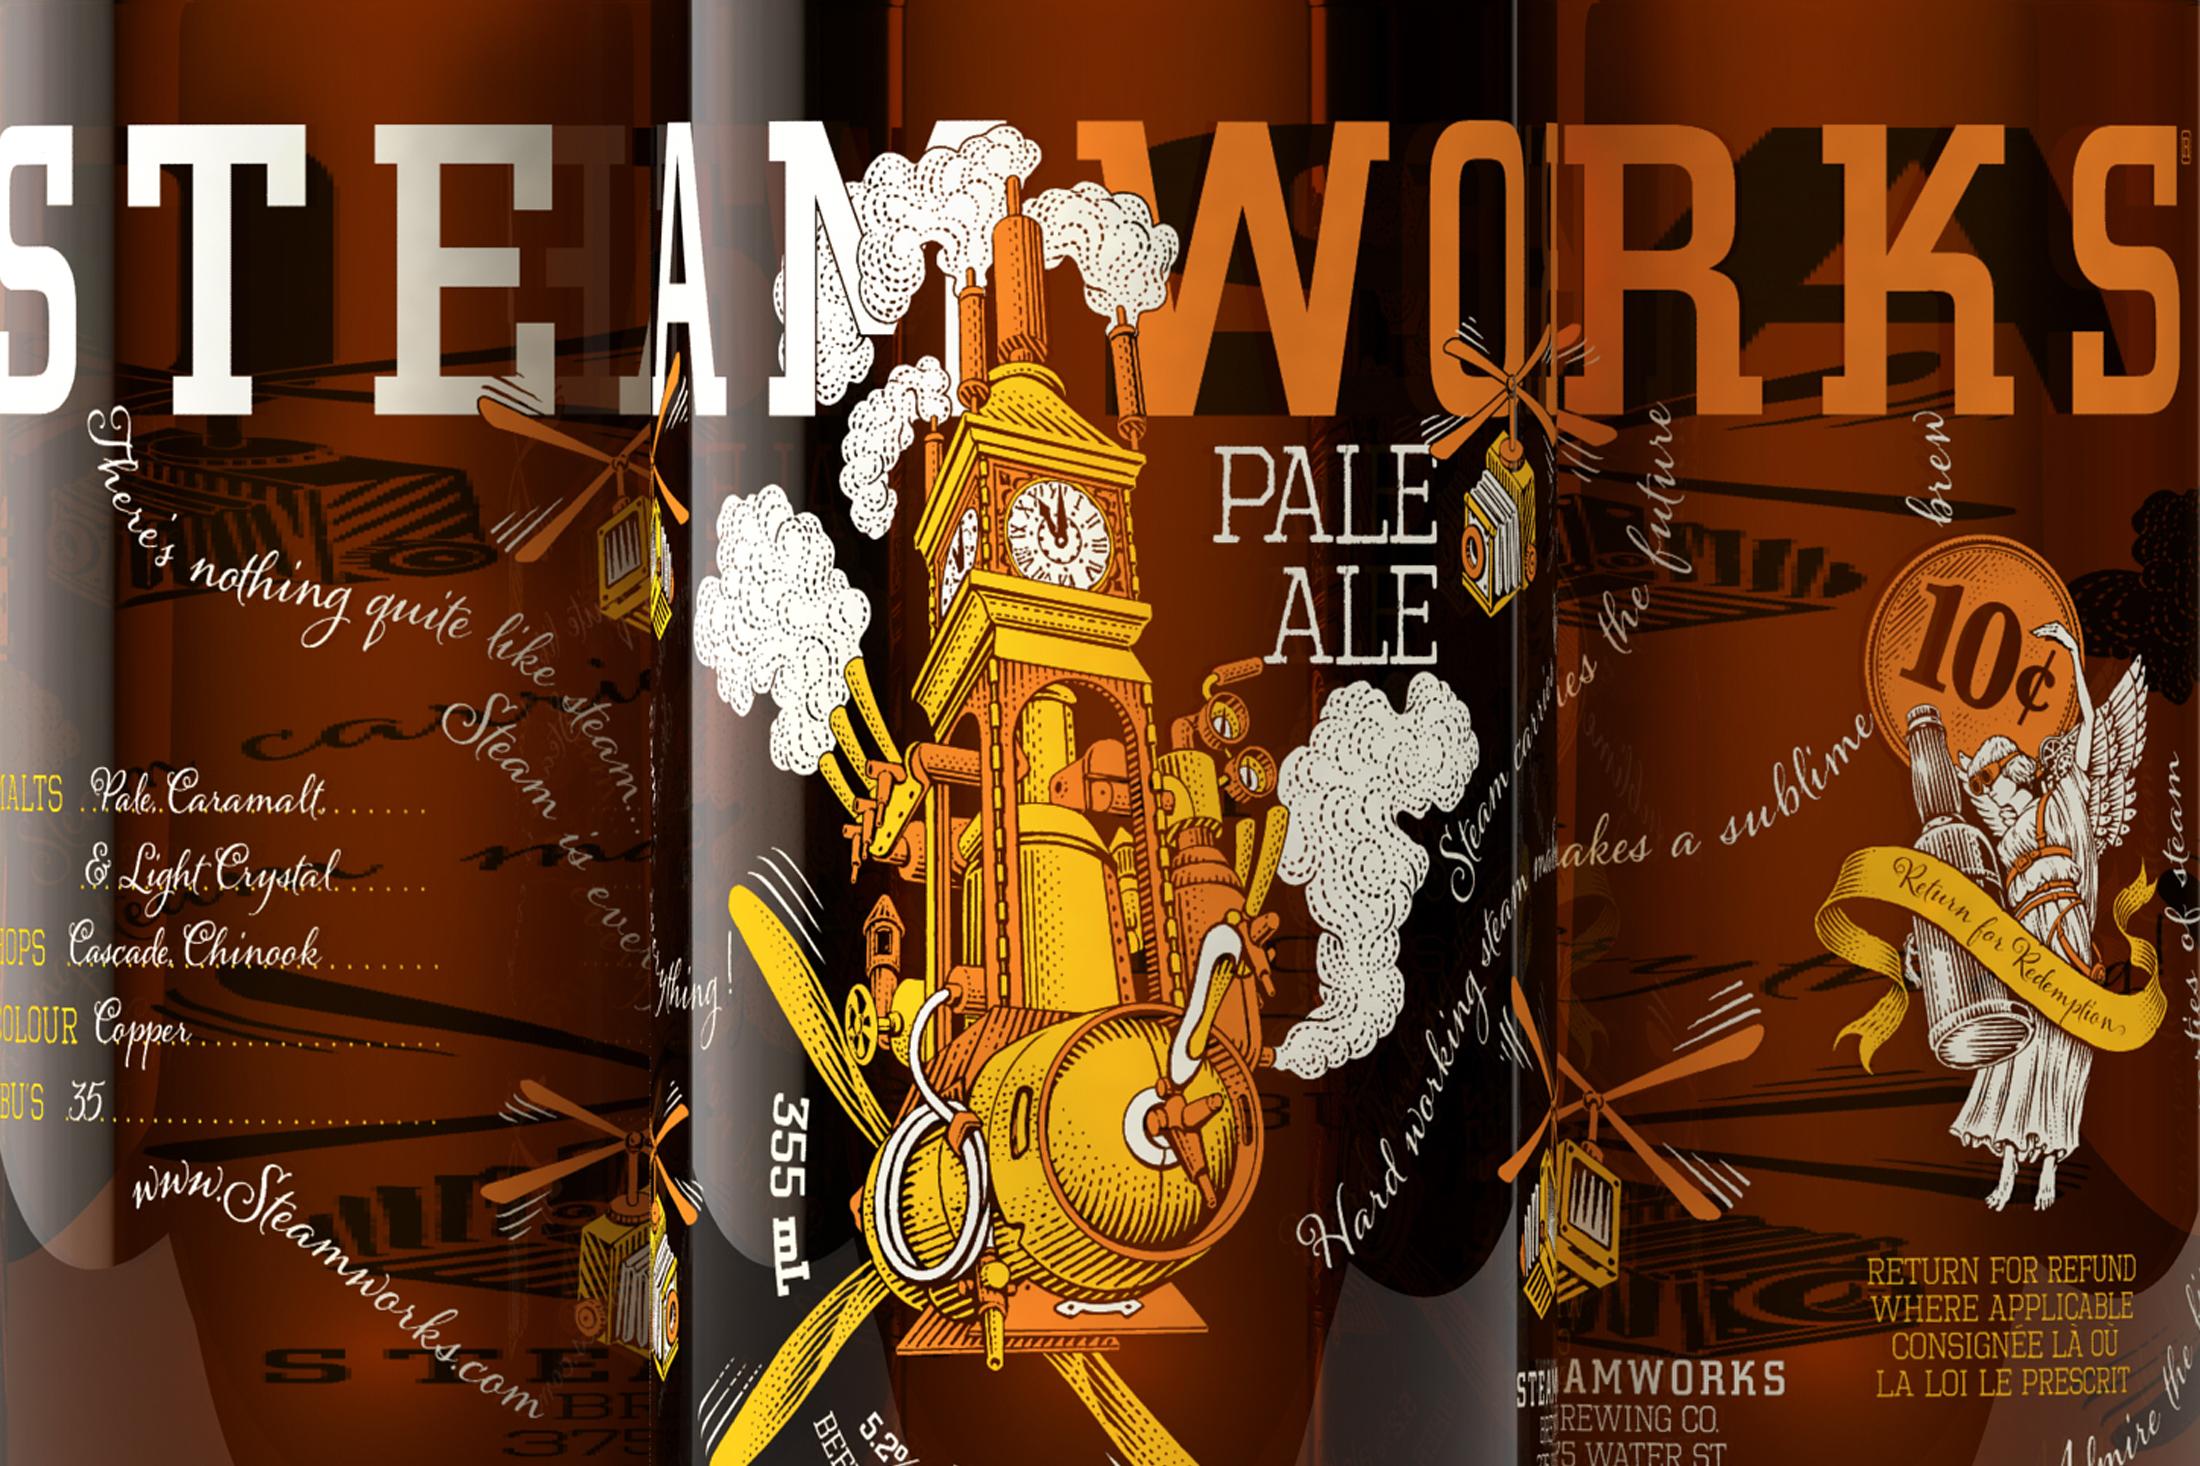 LaurieMillotte-Steamworks-pale ale detail.jpg